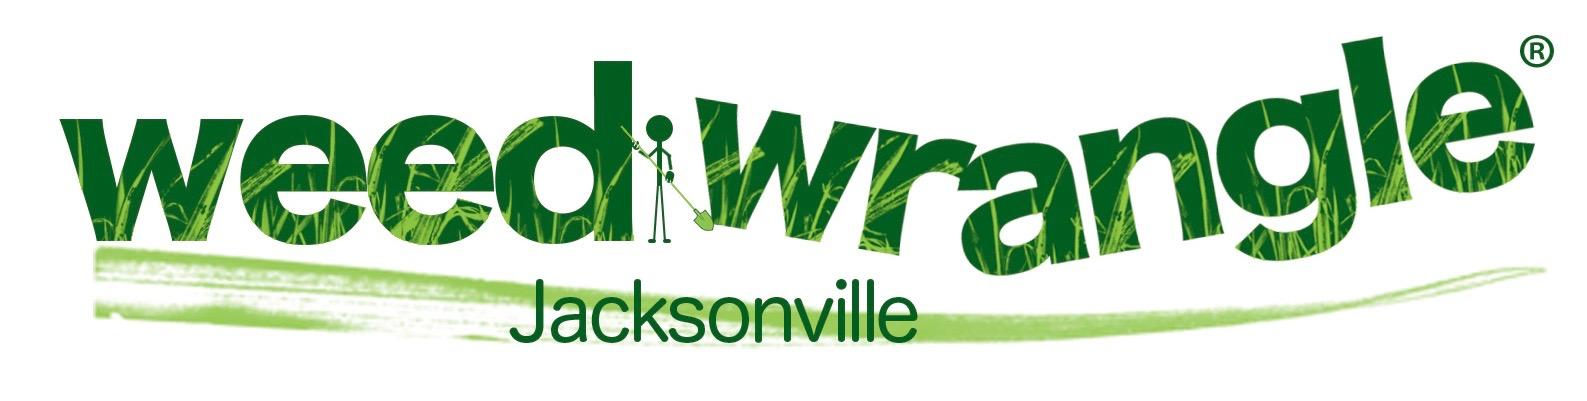 weedwrangle_jacksonville